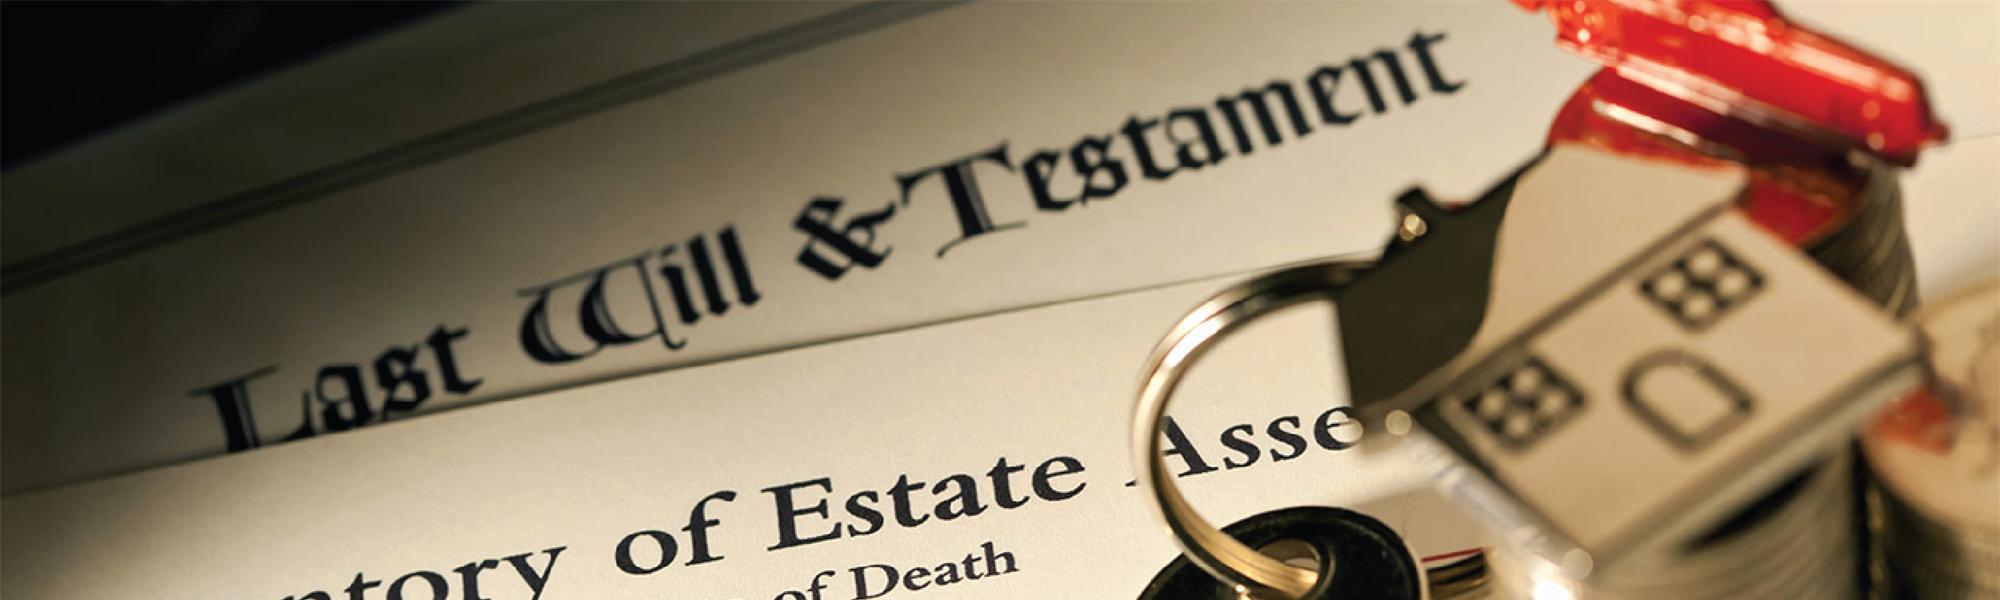 Heirship Affidavits vs. Probating Wills